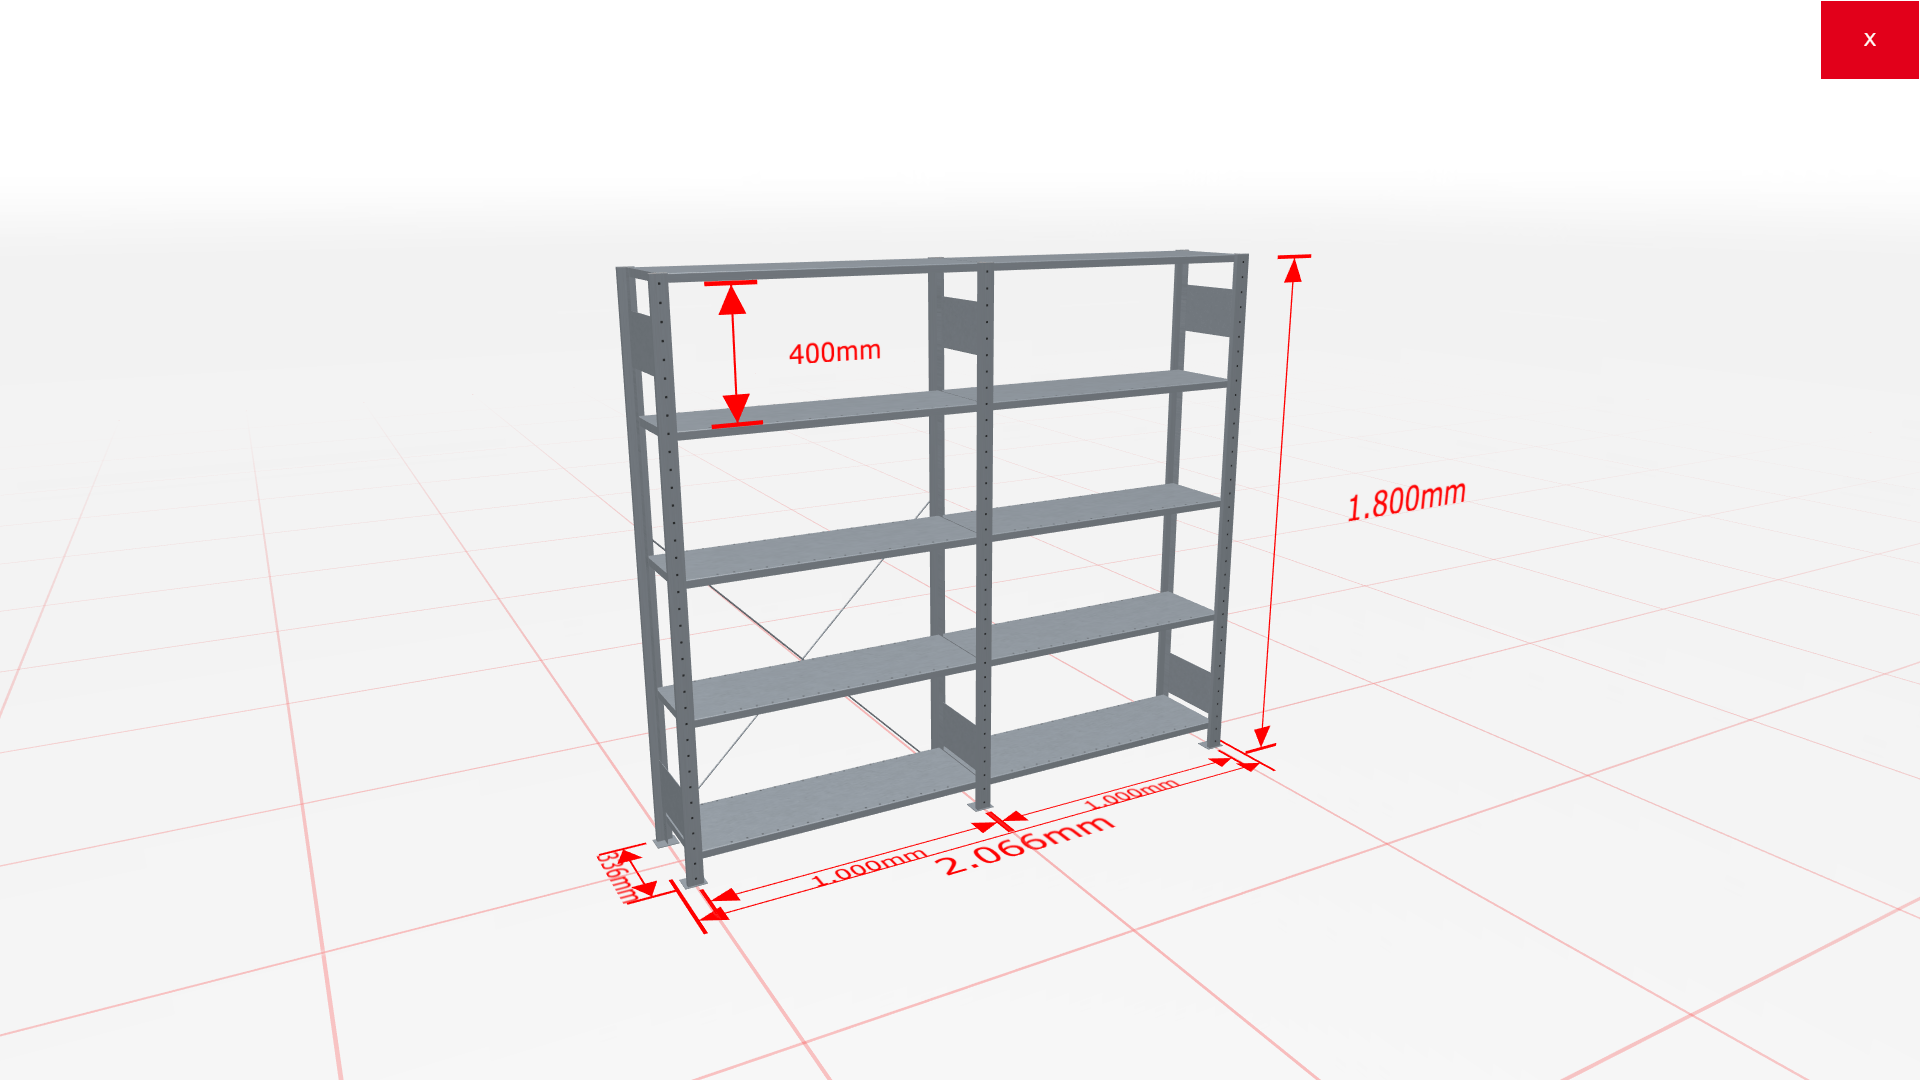 Fachbodenregal Komplettregal 1800x2066x300 mm (HxBxT) SCHULTE Lagertechnik verzinkt 5 Ebenen  150 kg je Boden